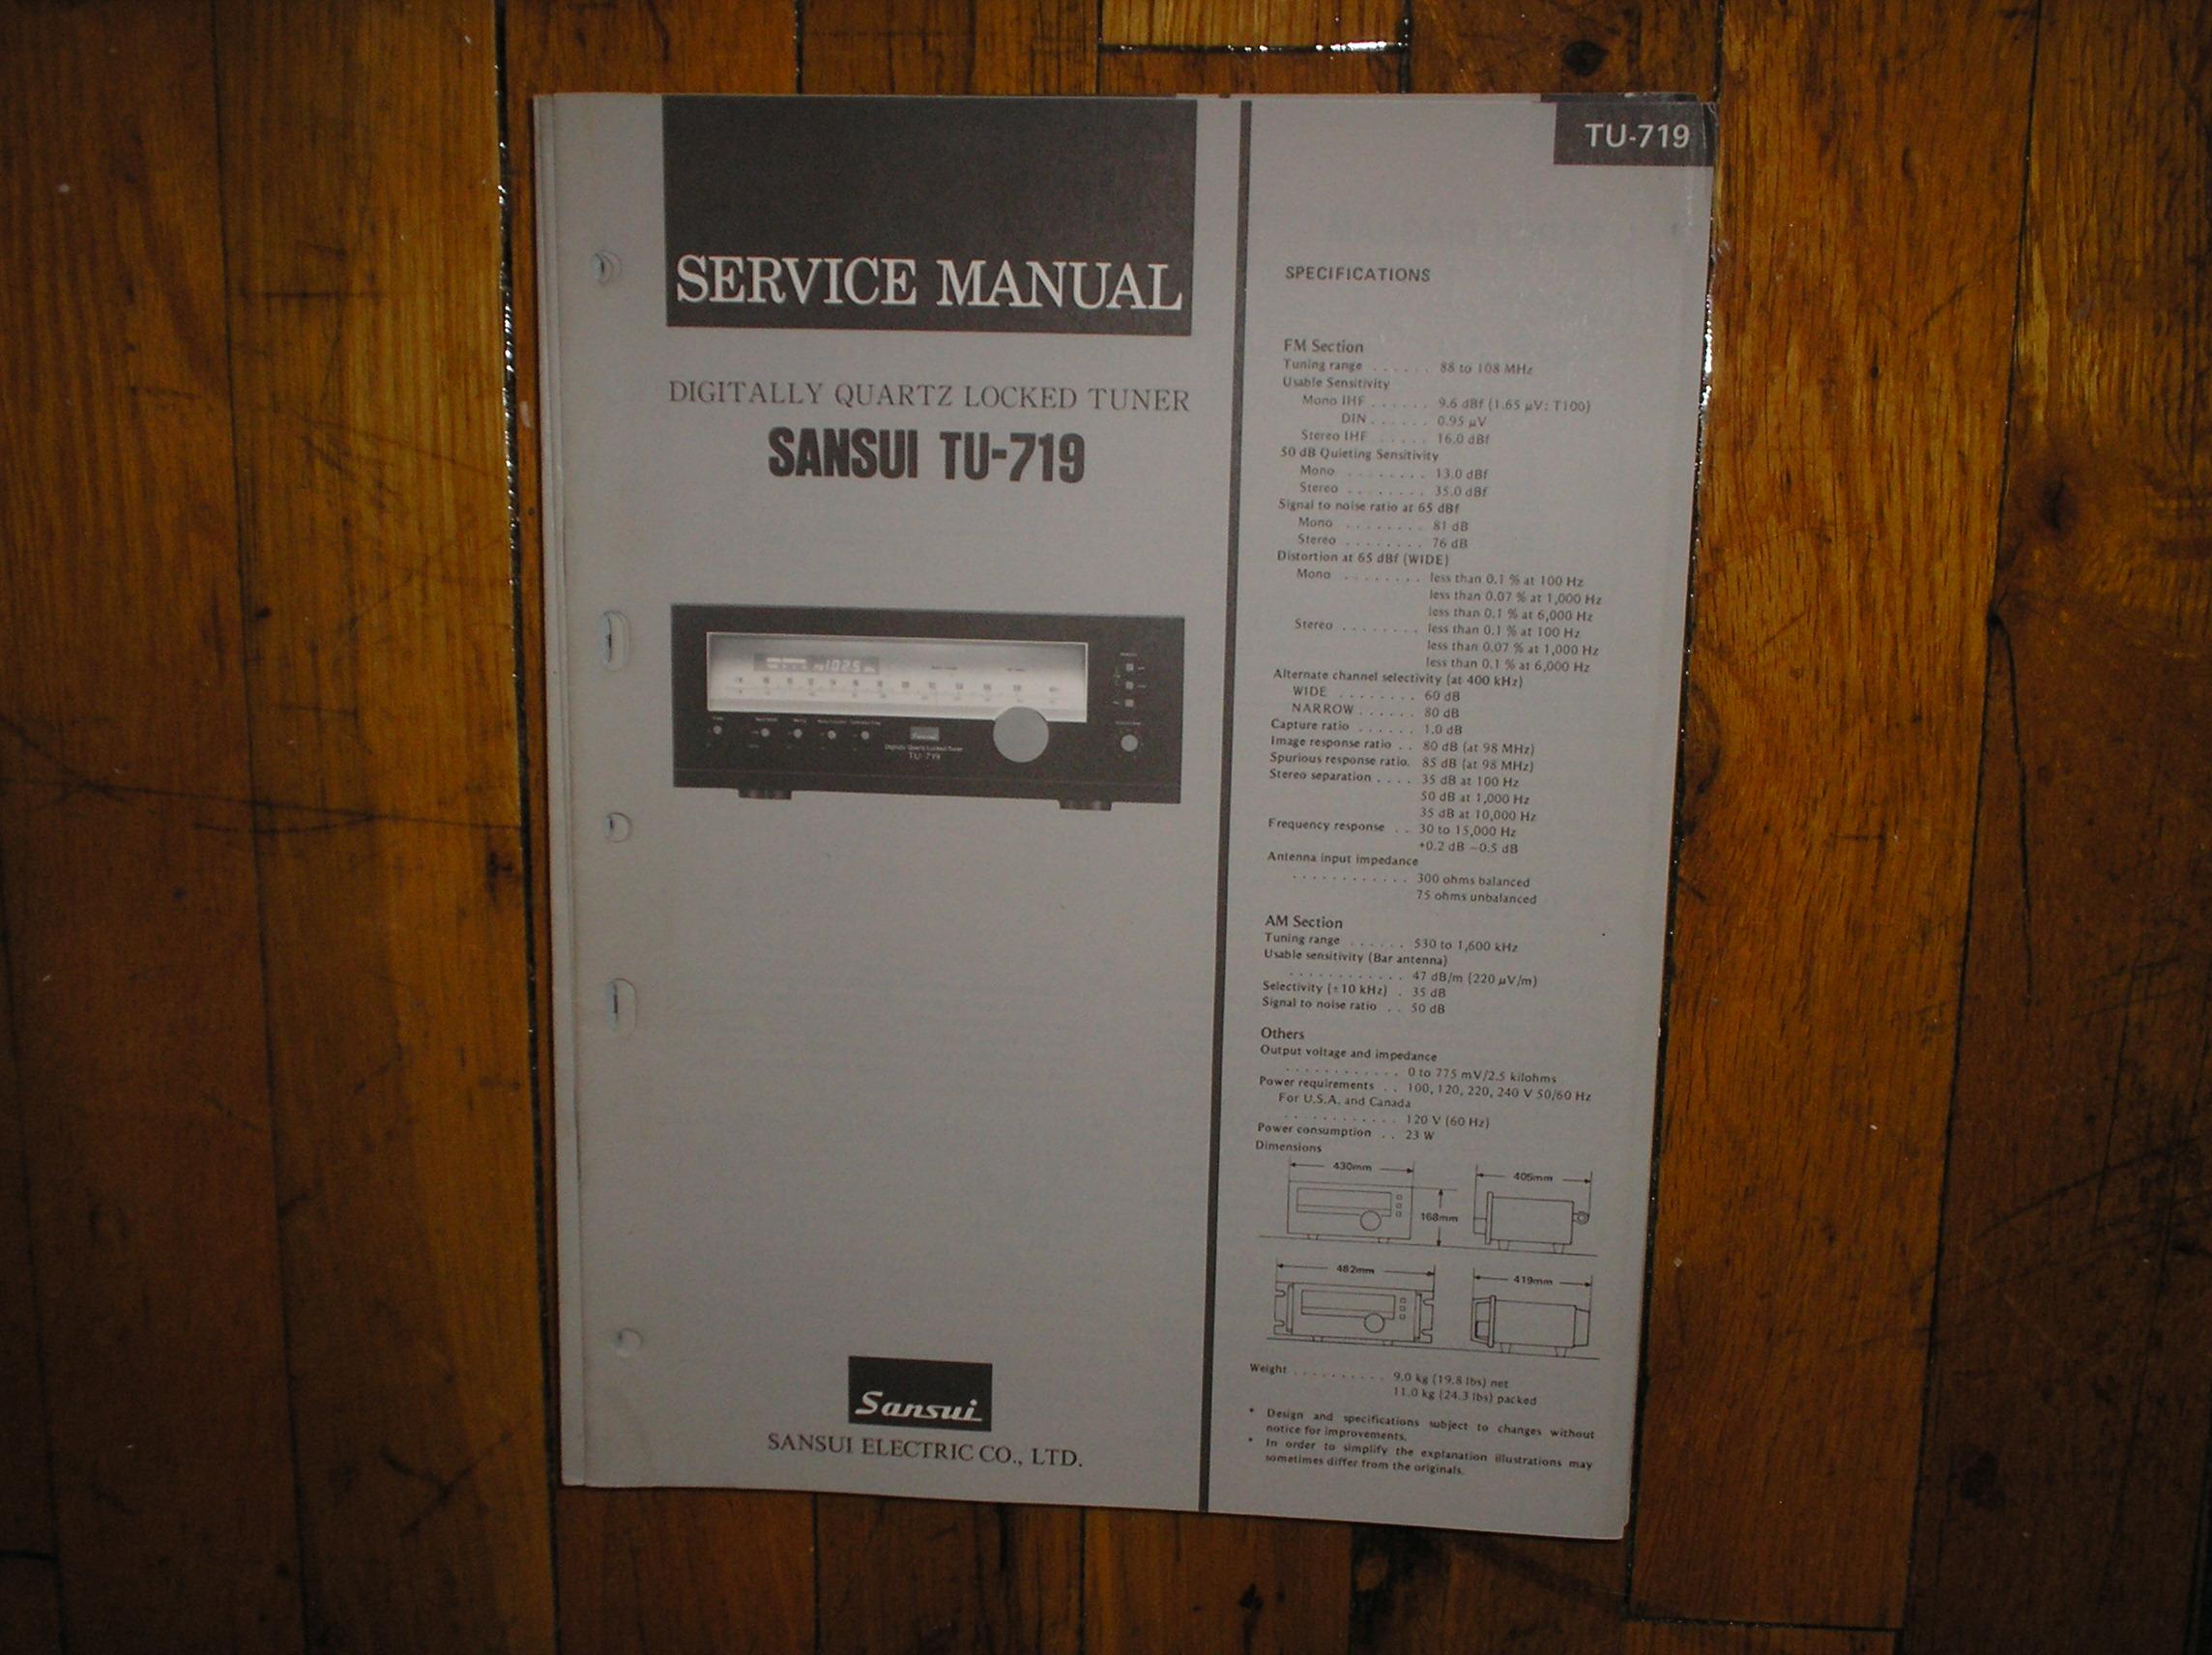 TU-719 Tuner Service Manual